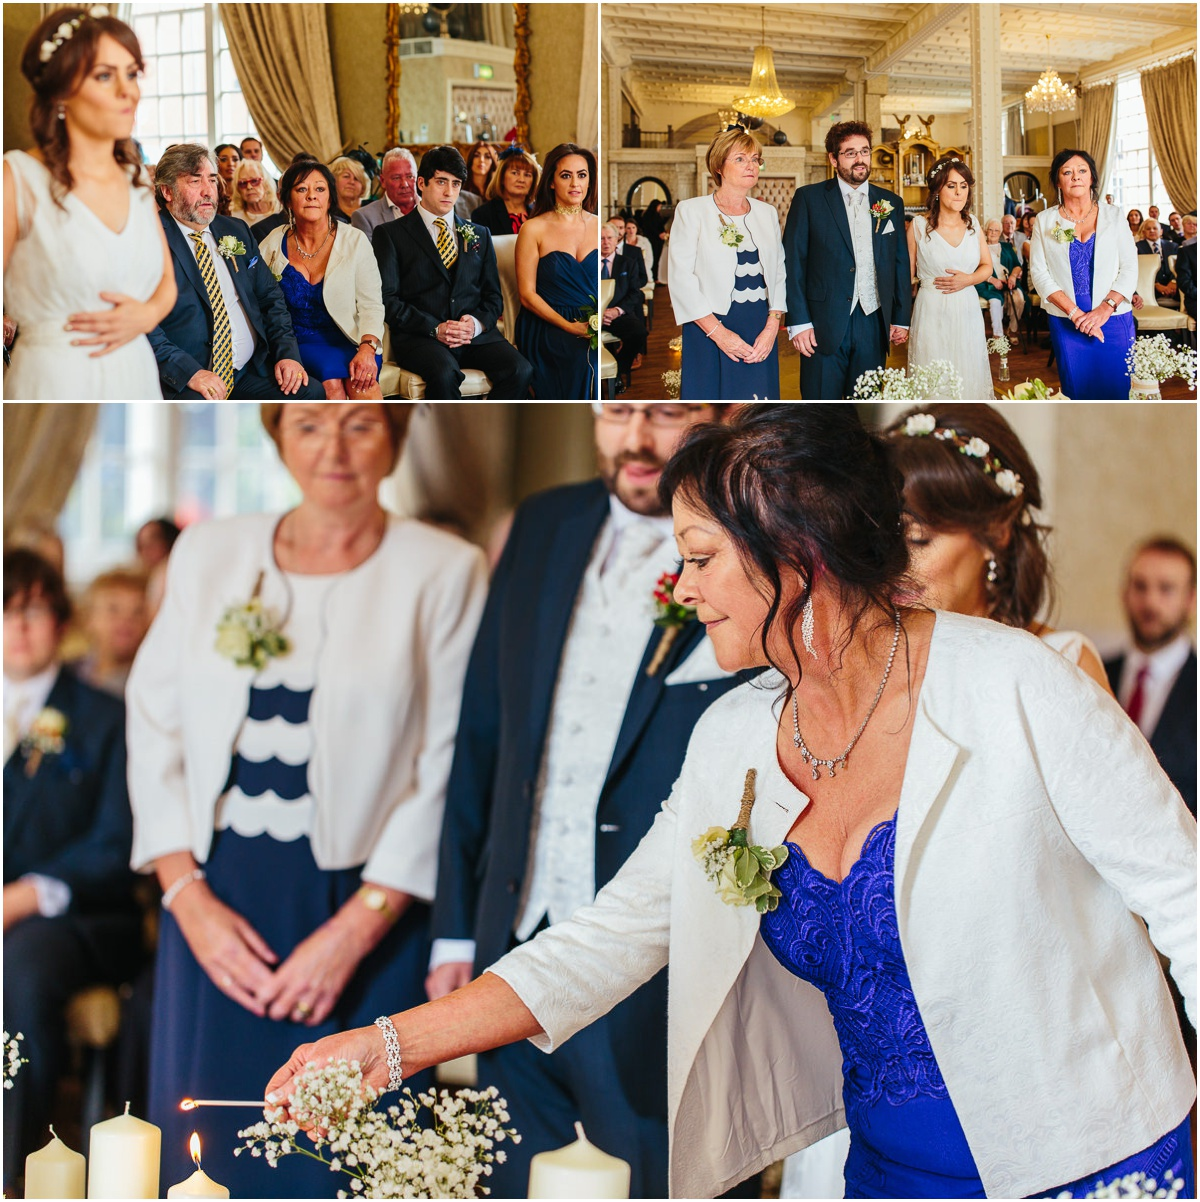 family lighting candle st james street liverpool wedding